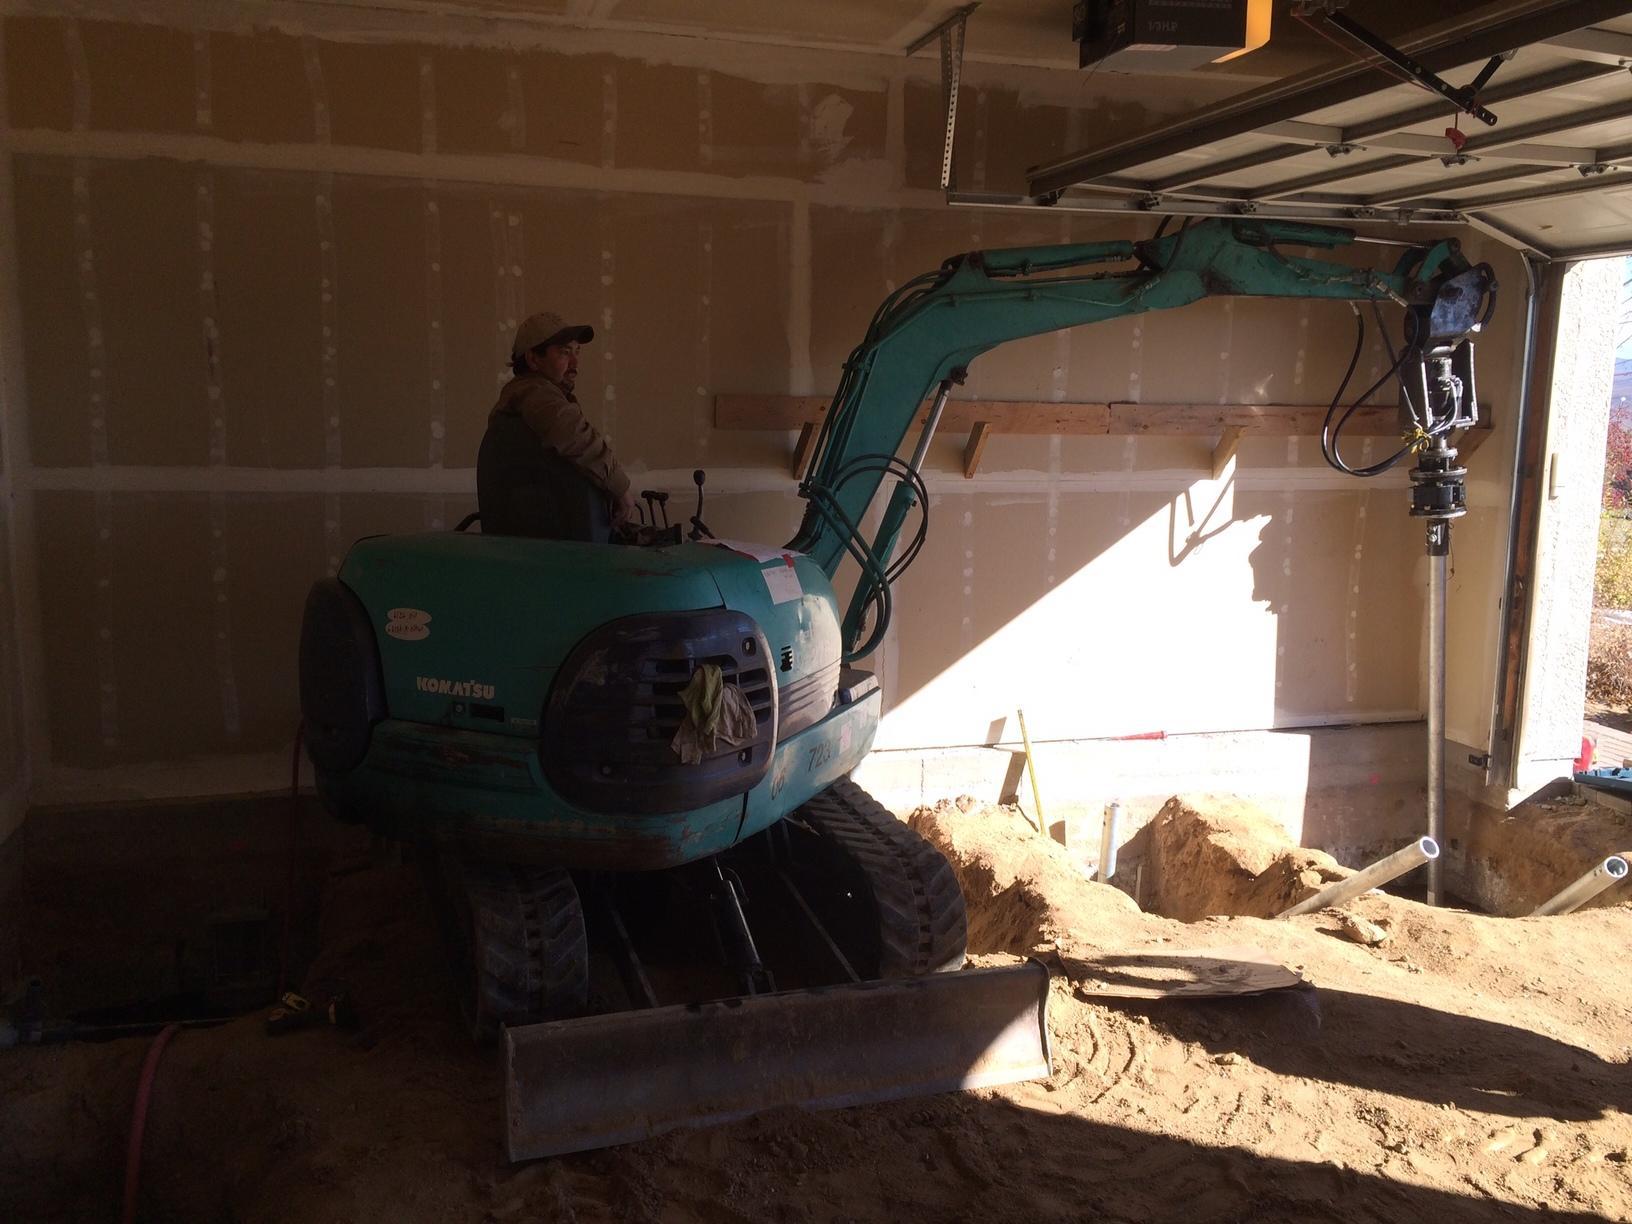 Foundation Repair Sparks, NV 89436